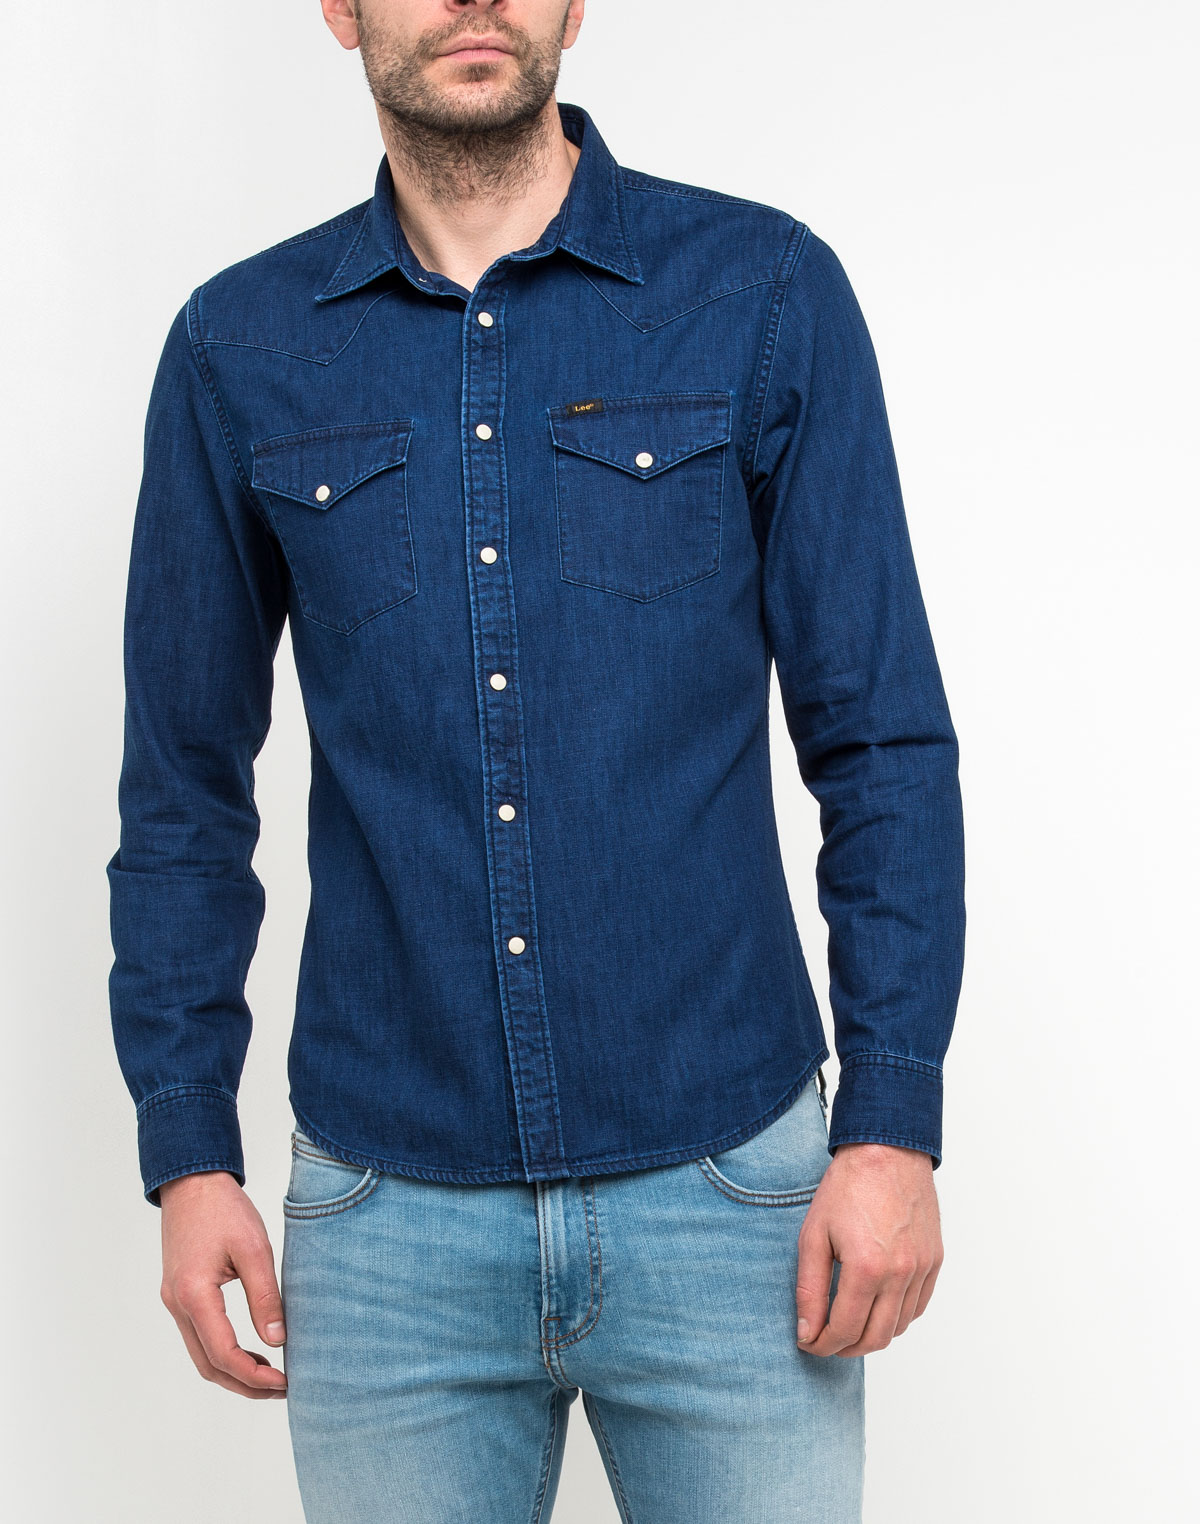 Купить Рубашка мужская Lee, цвет: синий. L643RYTL. Размер L (50)